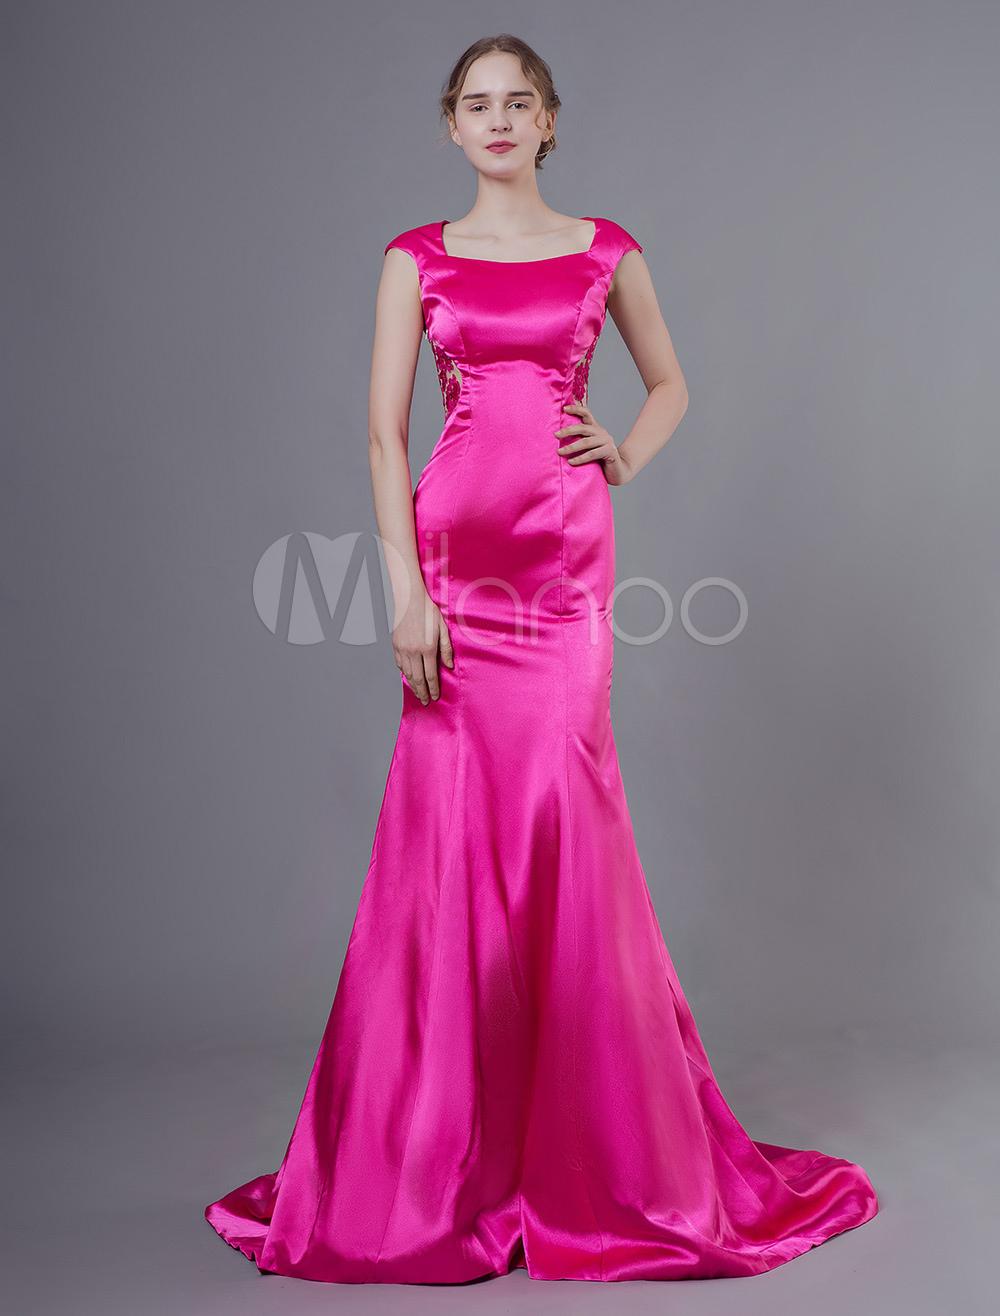 Abendkleider rose gro handel abendkleider rose online - Milanoo abendkleider ...